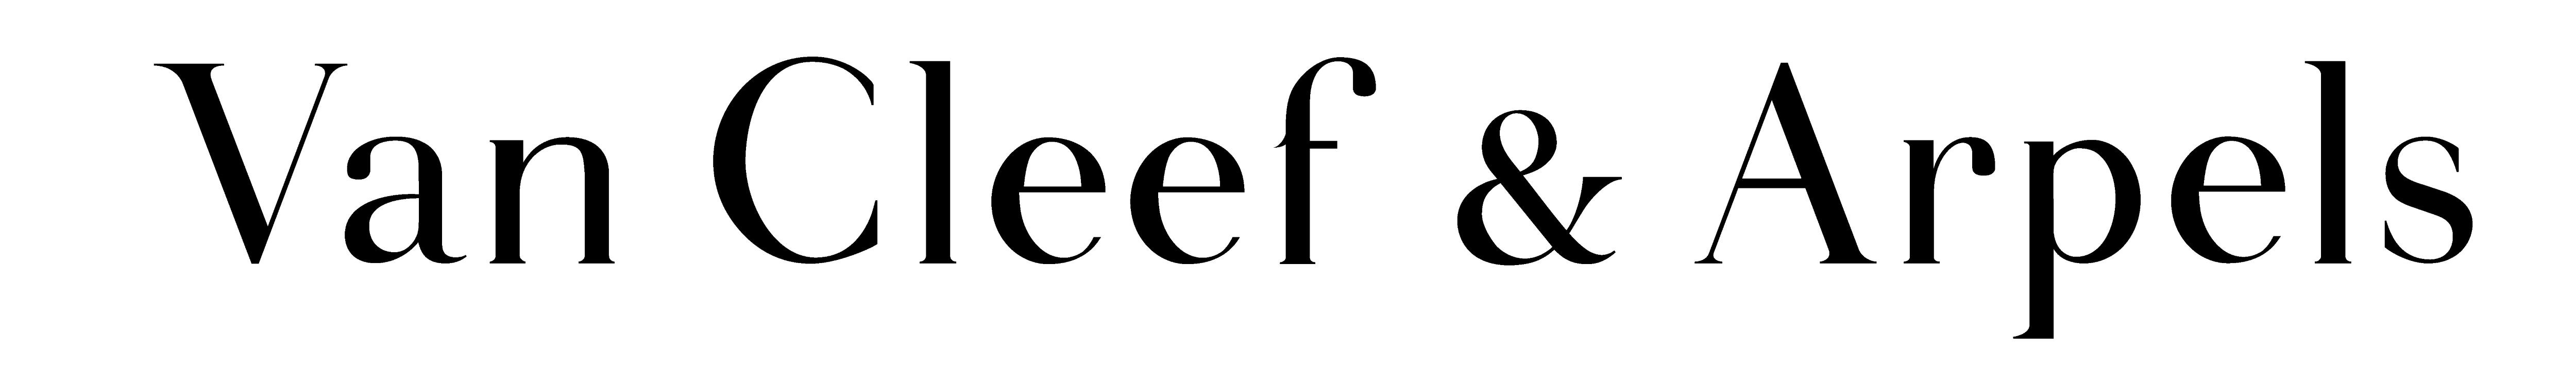 Van Cleef & Arpels logo, logotype, wordmark